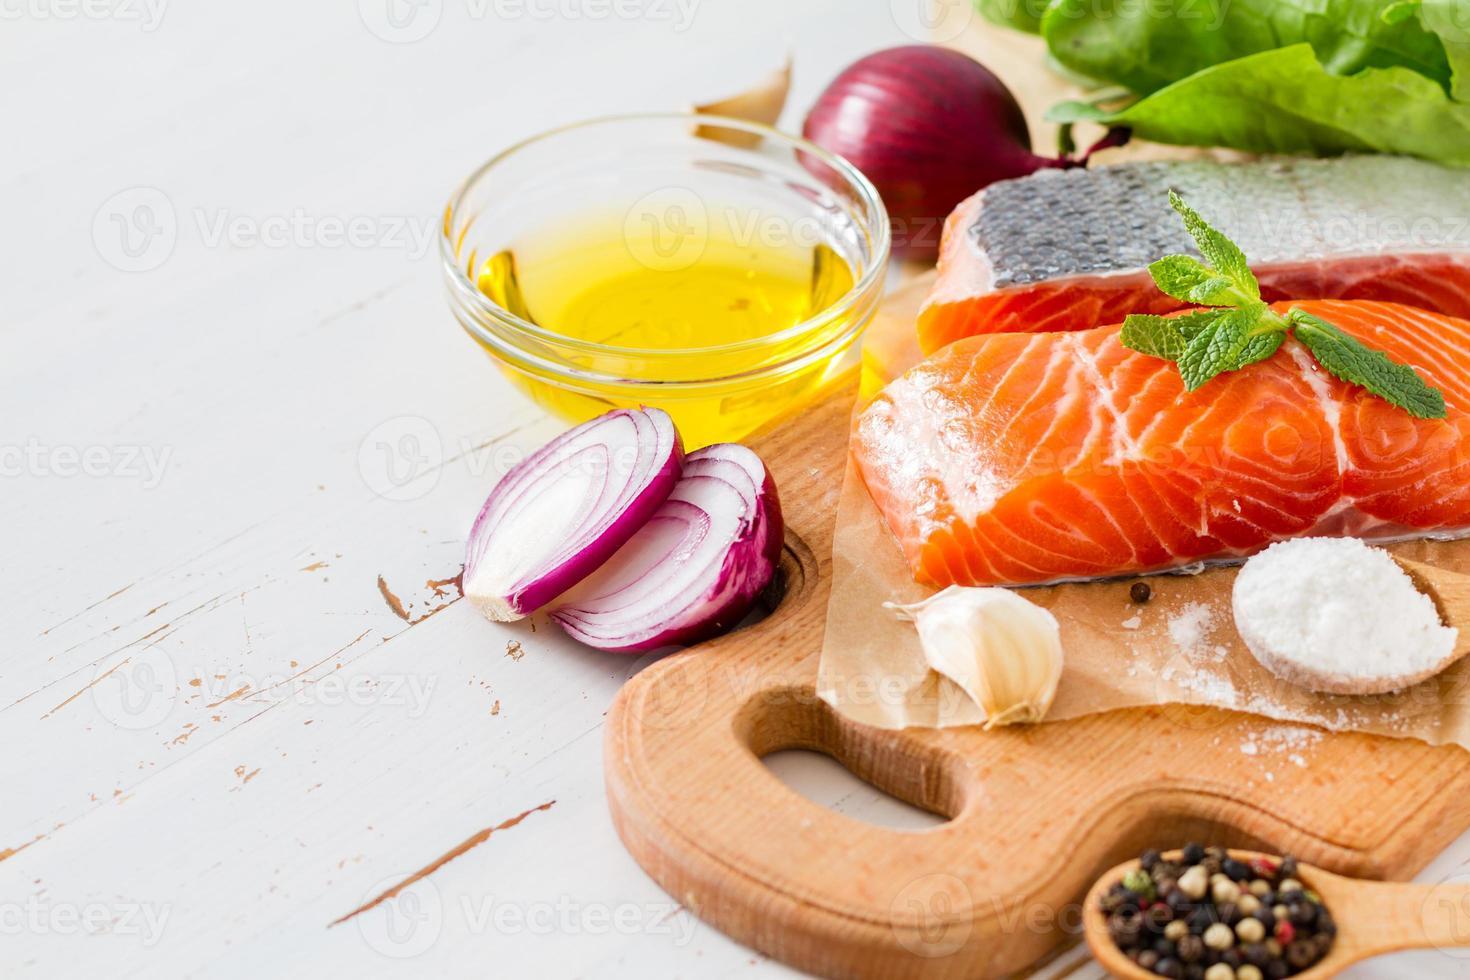 Lachsfilet mit Spinat, Salz, Pfeffer, Knoblauch, Öl foto